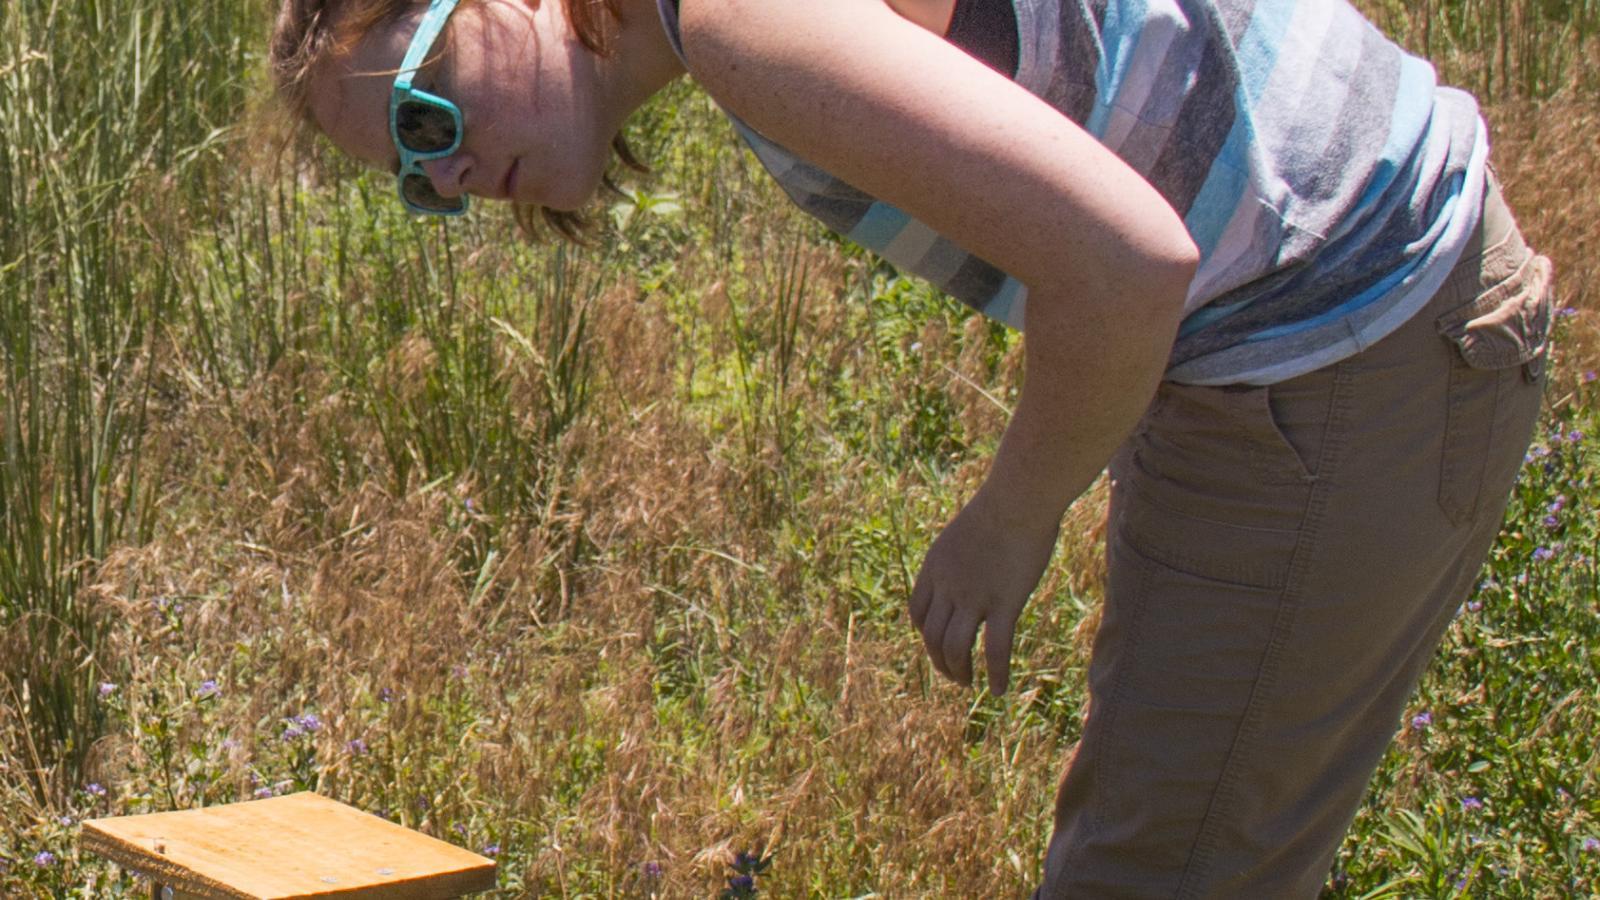 Morphew examines an artificial beehive.